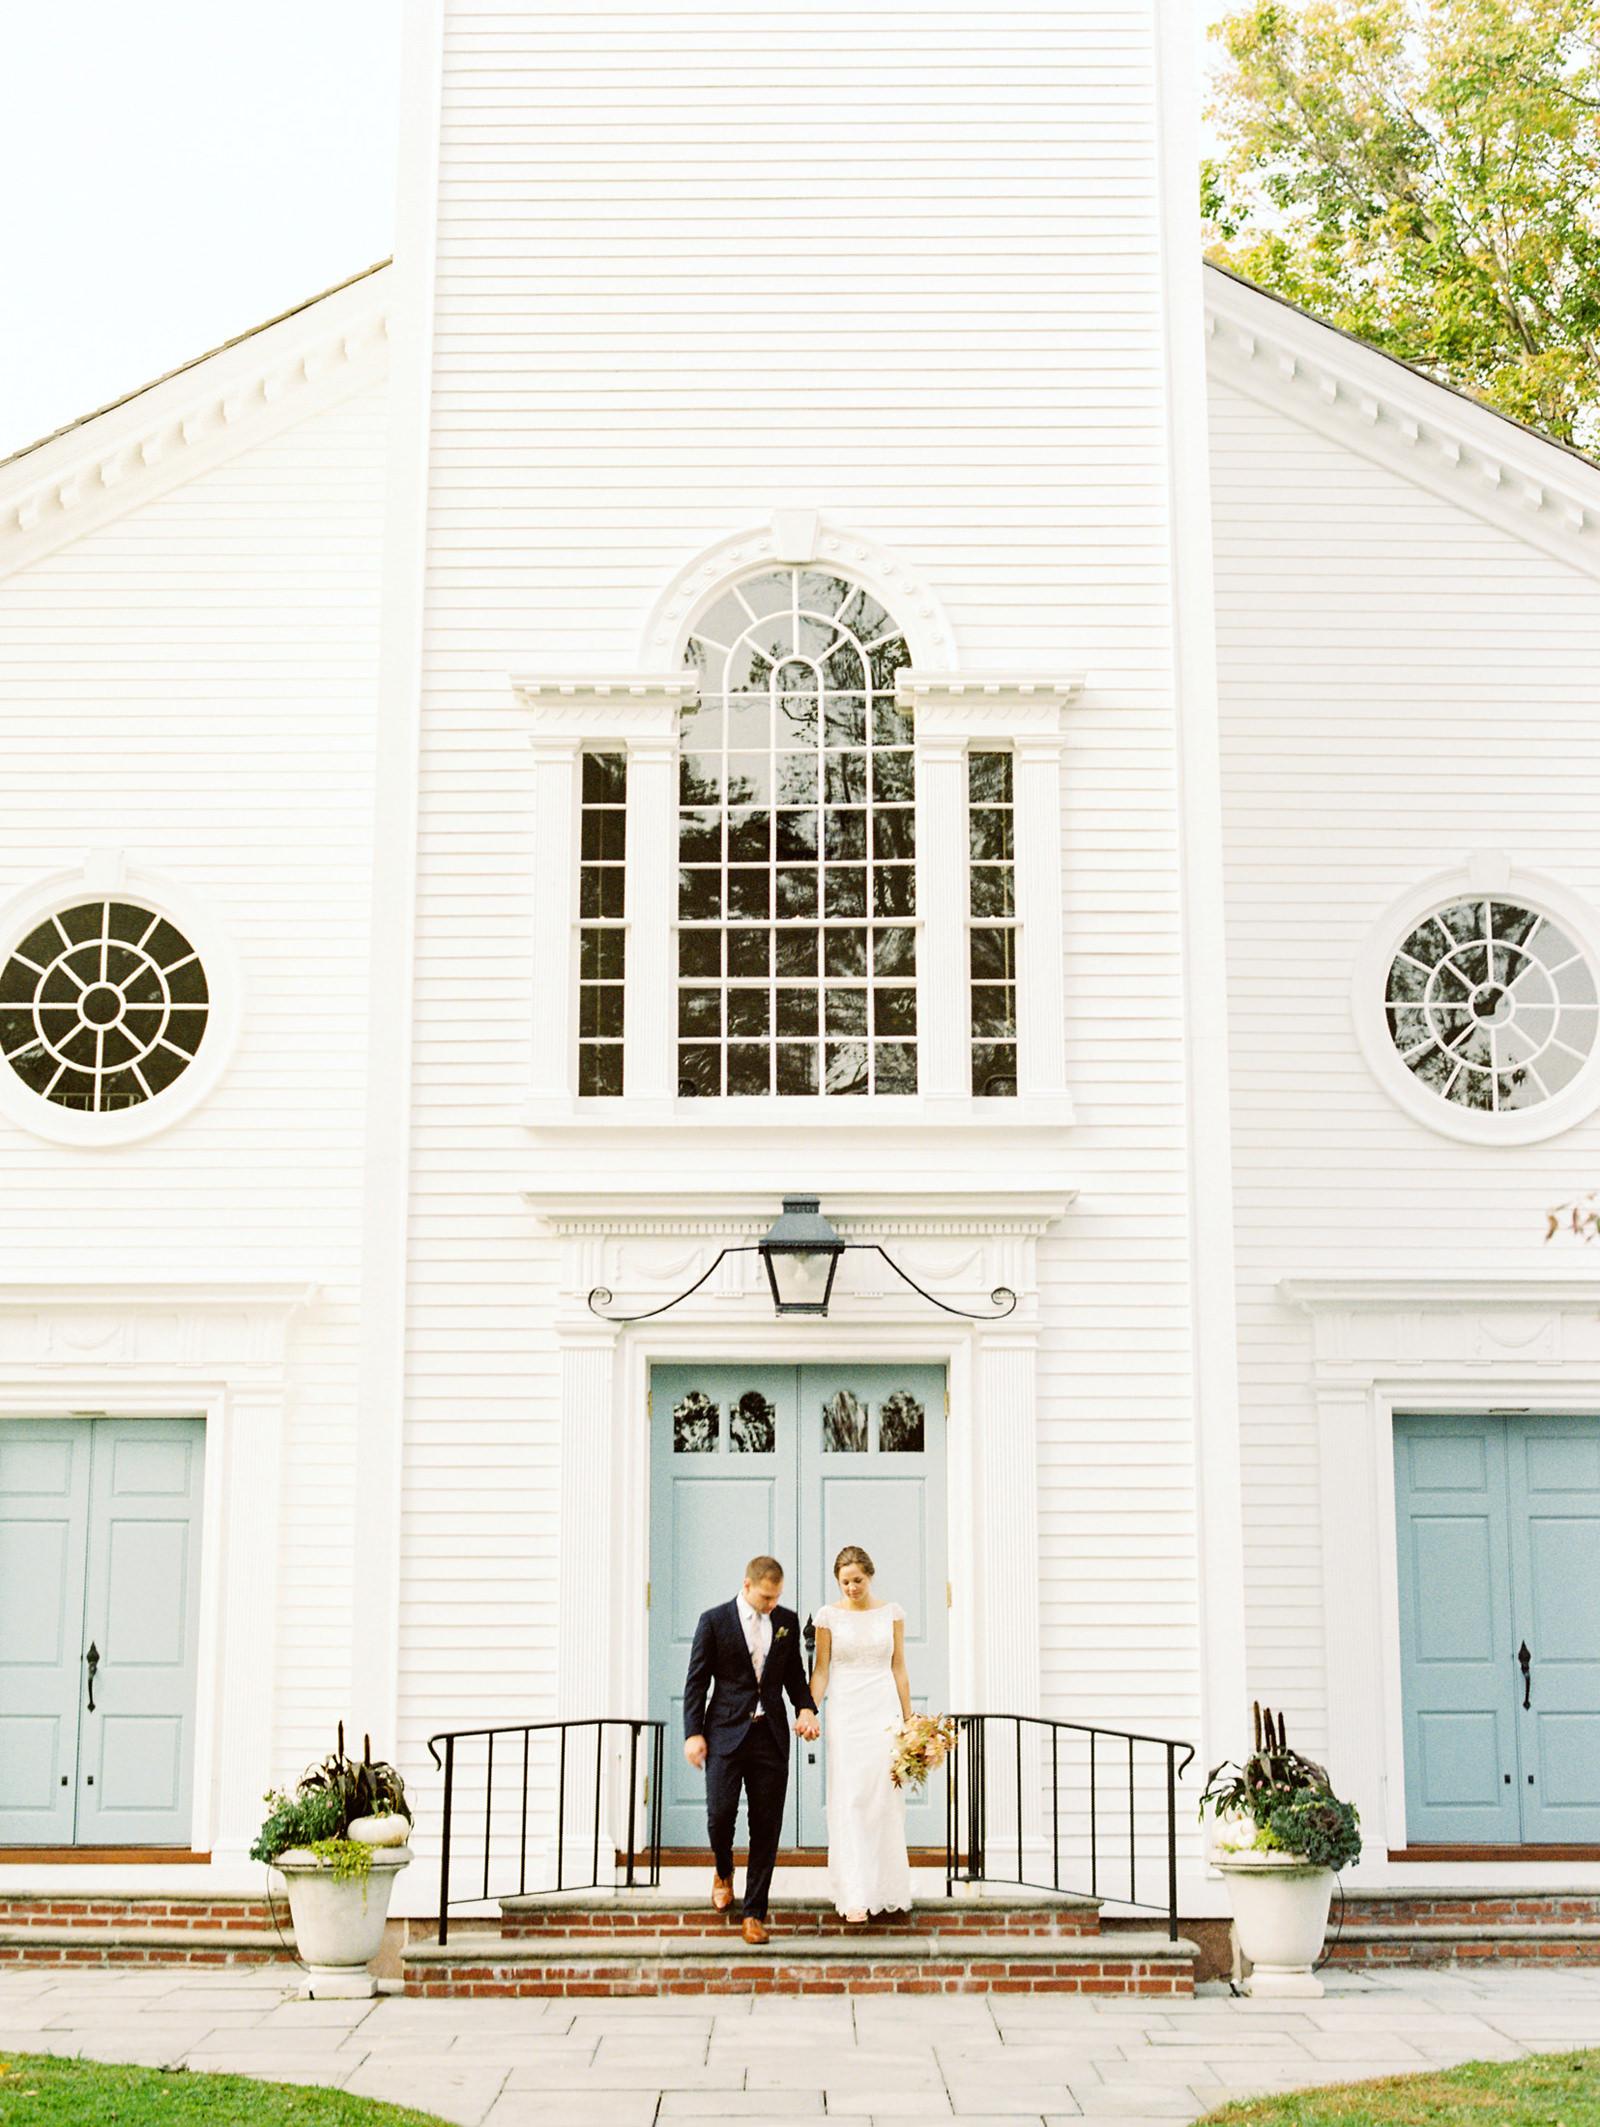 bridgeport-wedding-092 BRIDGEPORT, CONNECTICUT BACKYARD WEDDING